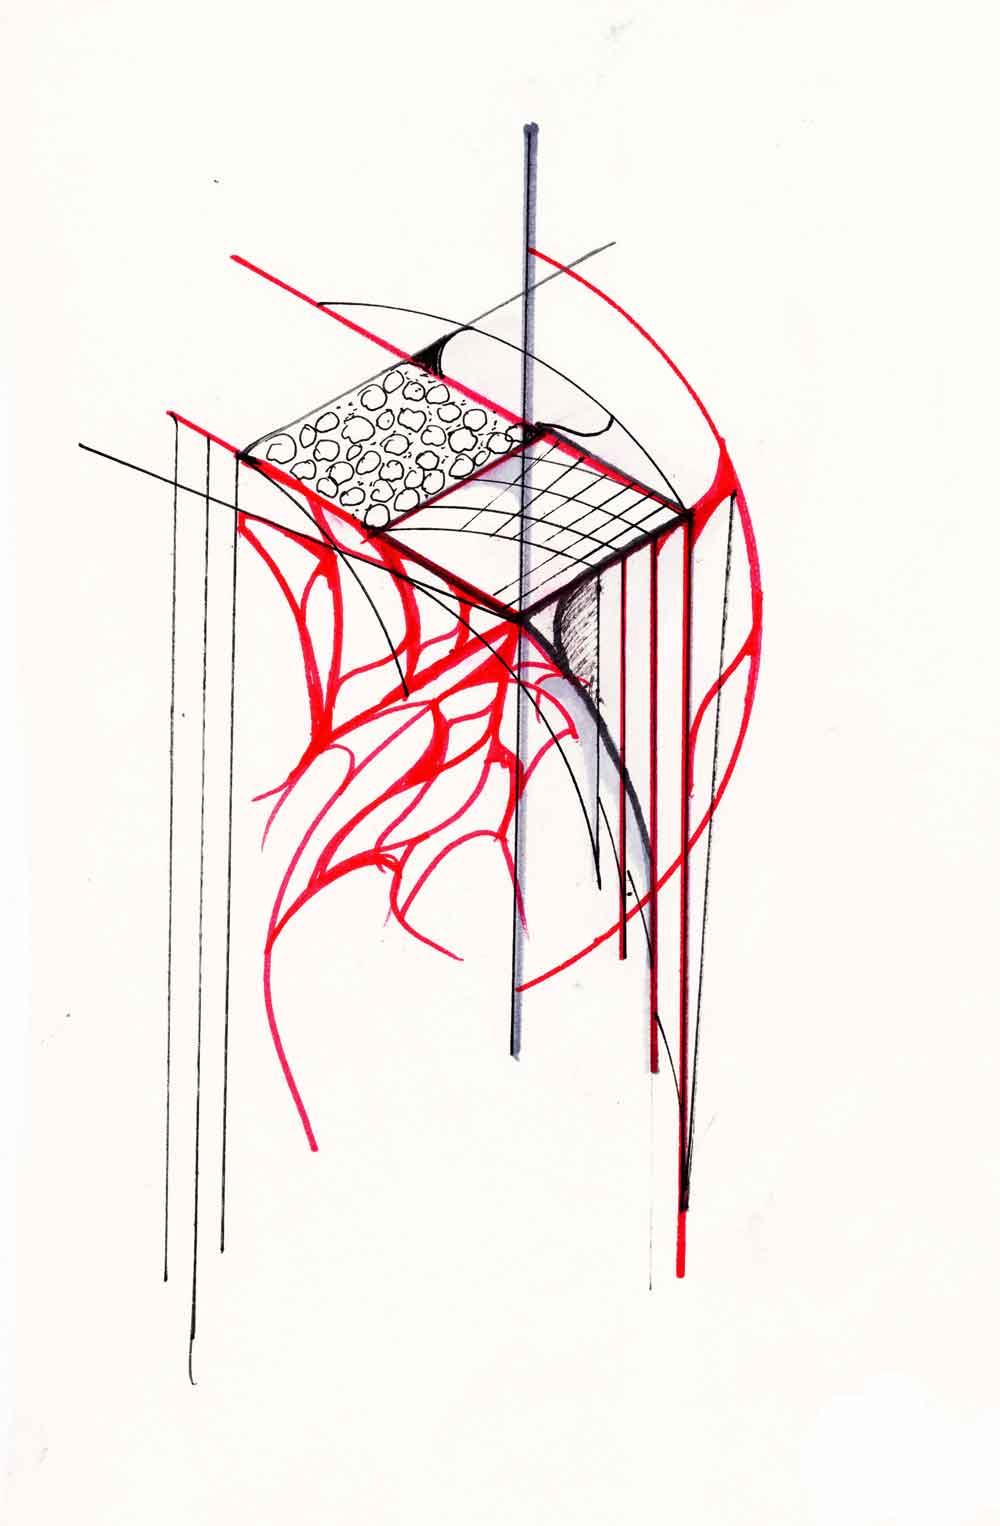 Ivette-cabrera-conceptual-art.jpg